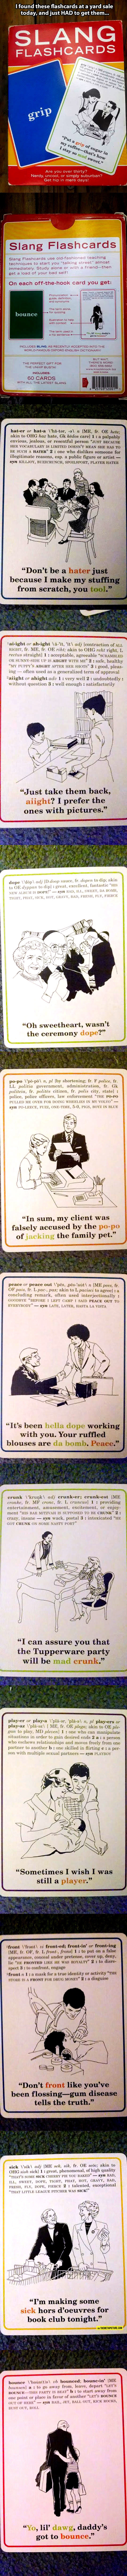 cool-slang-cards-box-words-hip